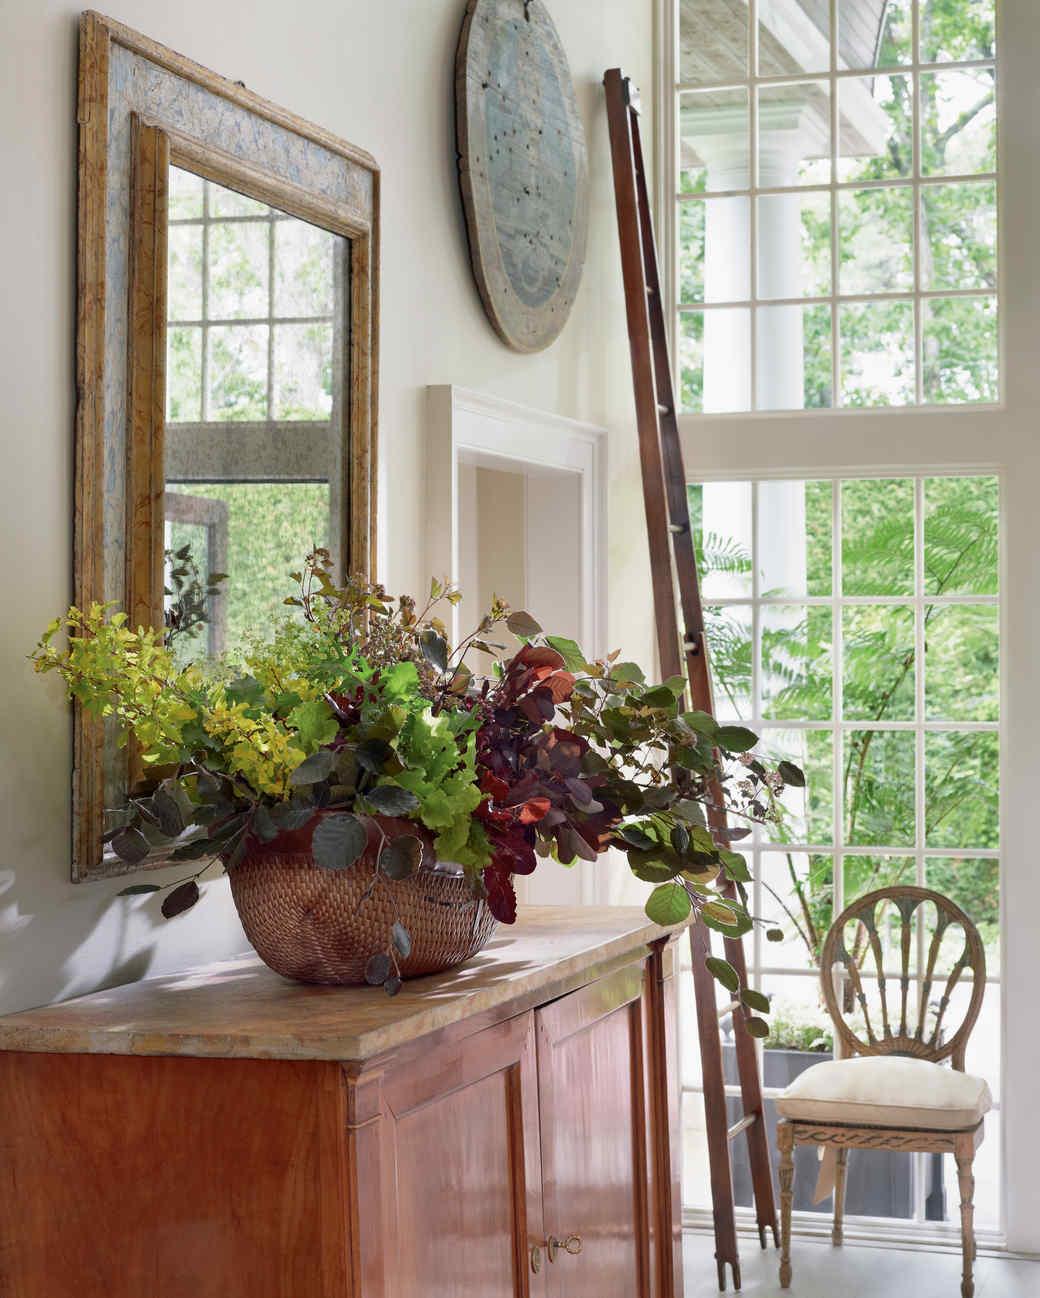 window-ladder-decorations.jpg